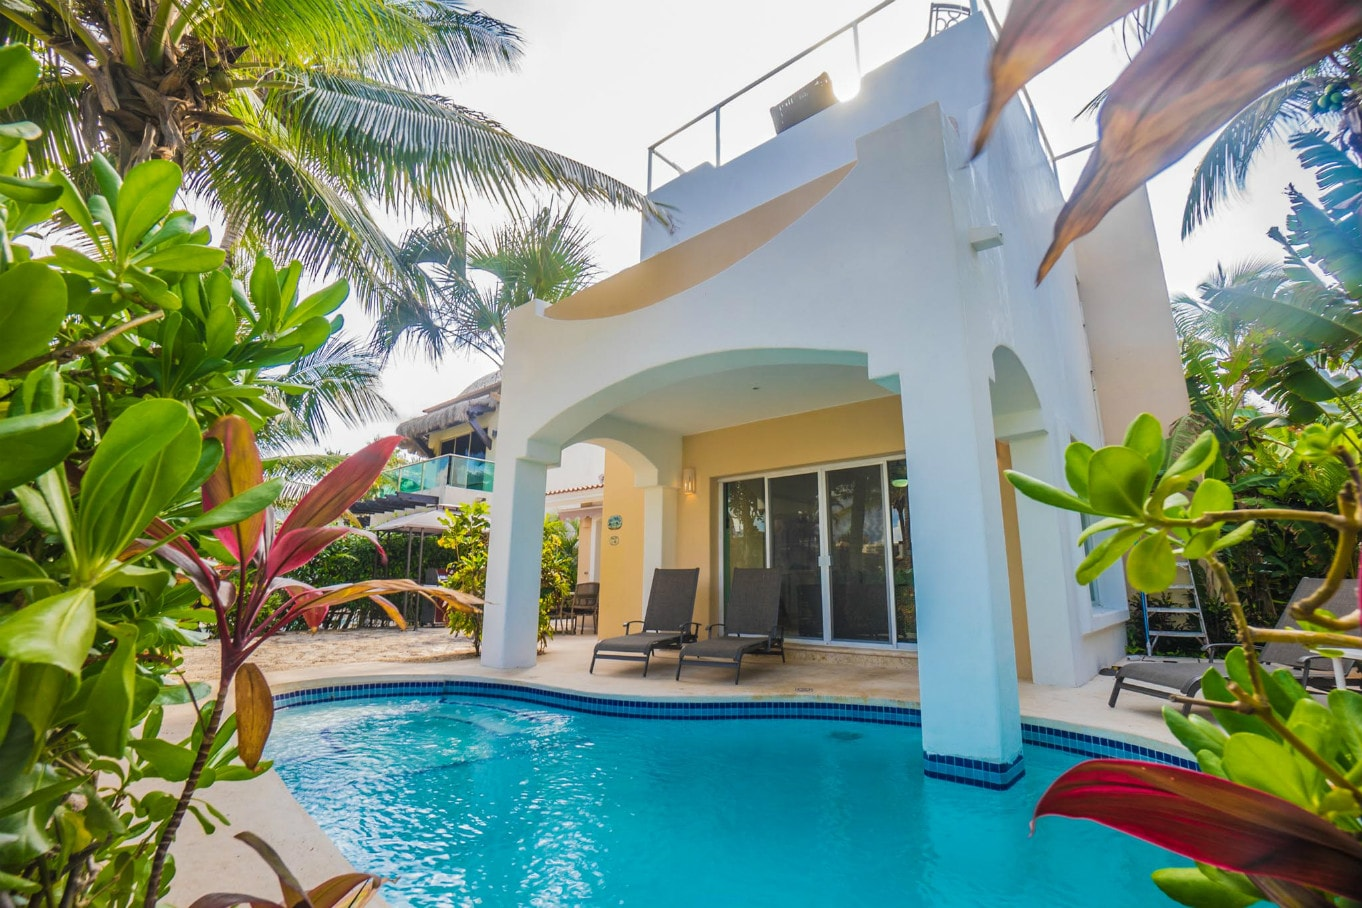 Casa Paraiso Beach House Playa Del Carmen